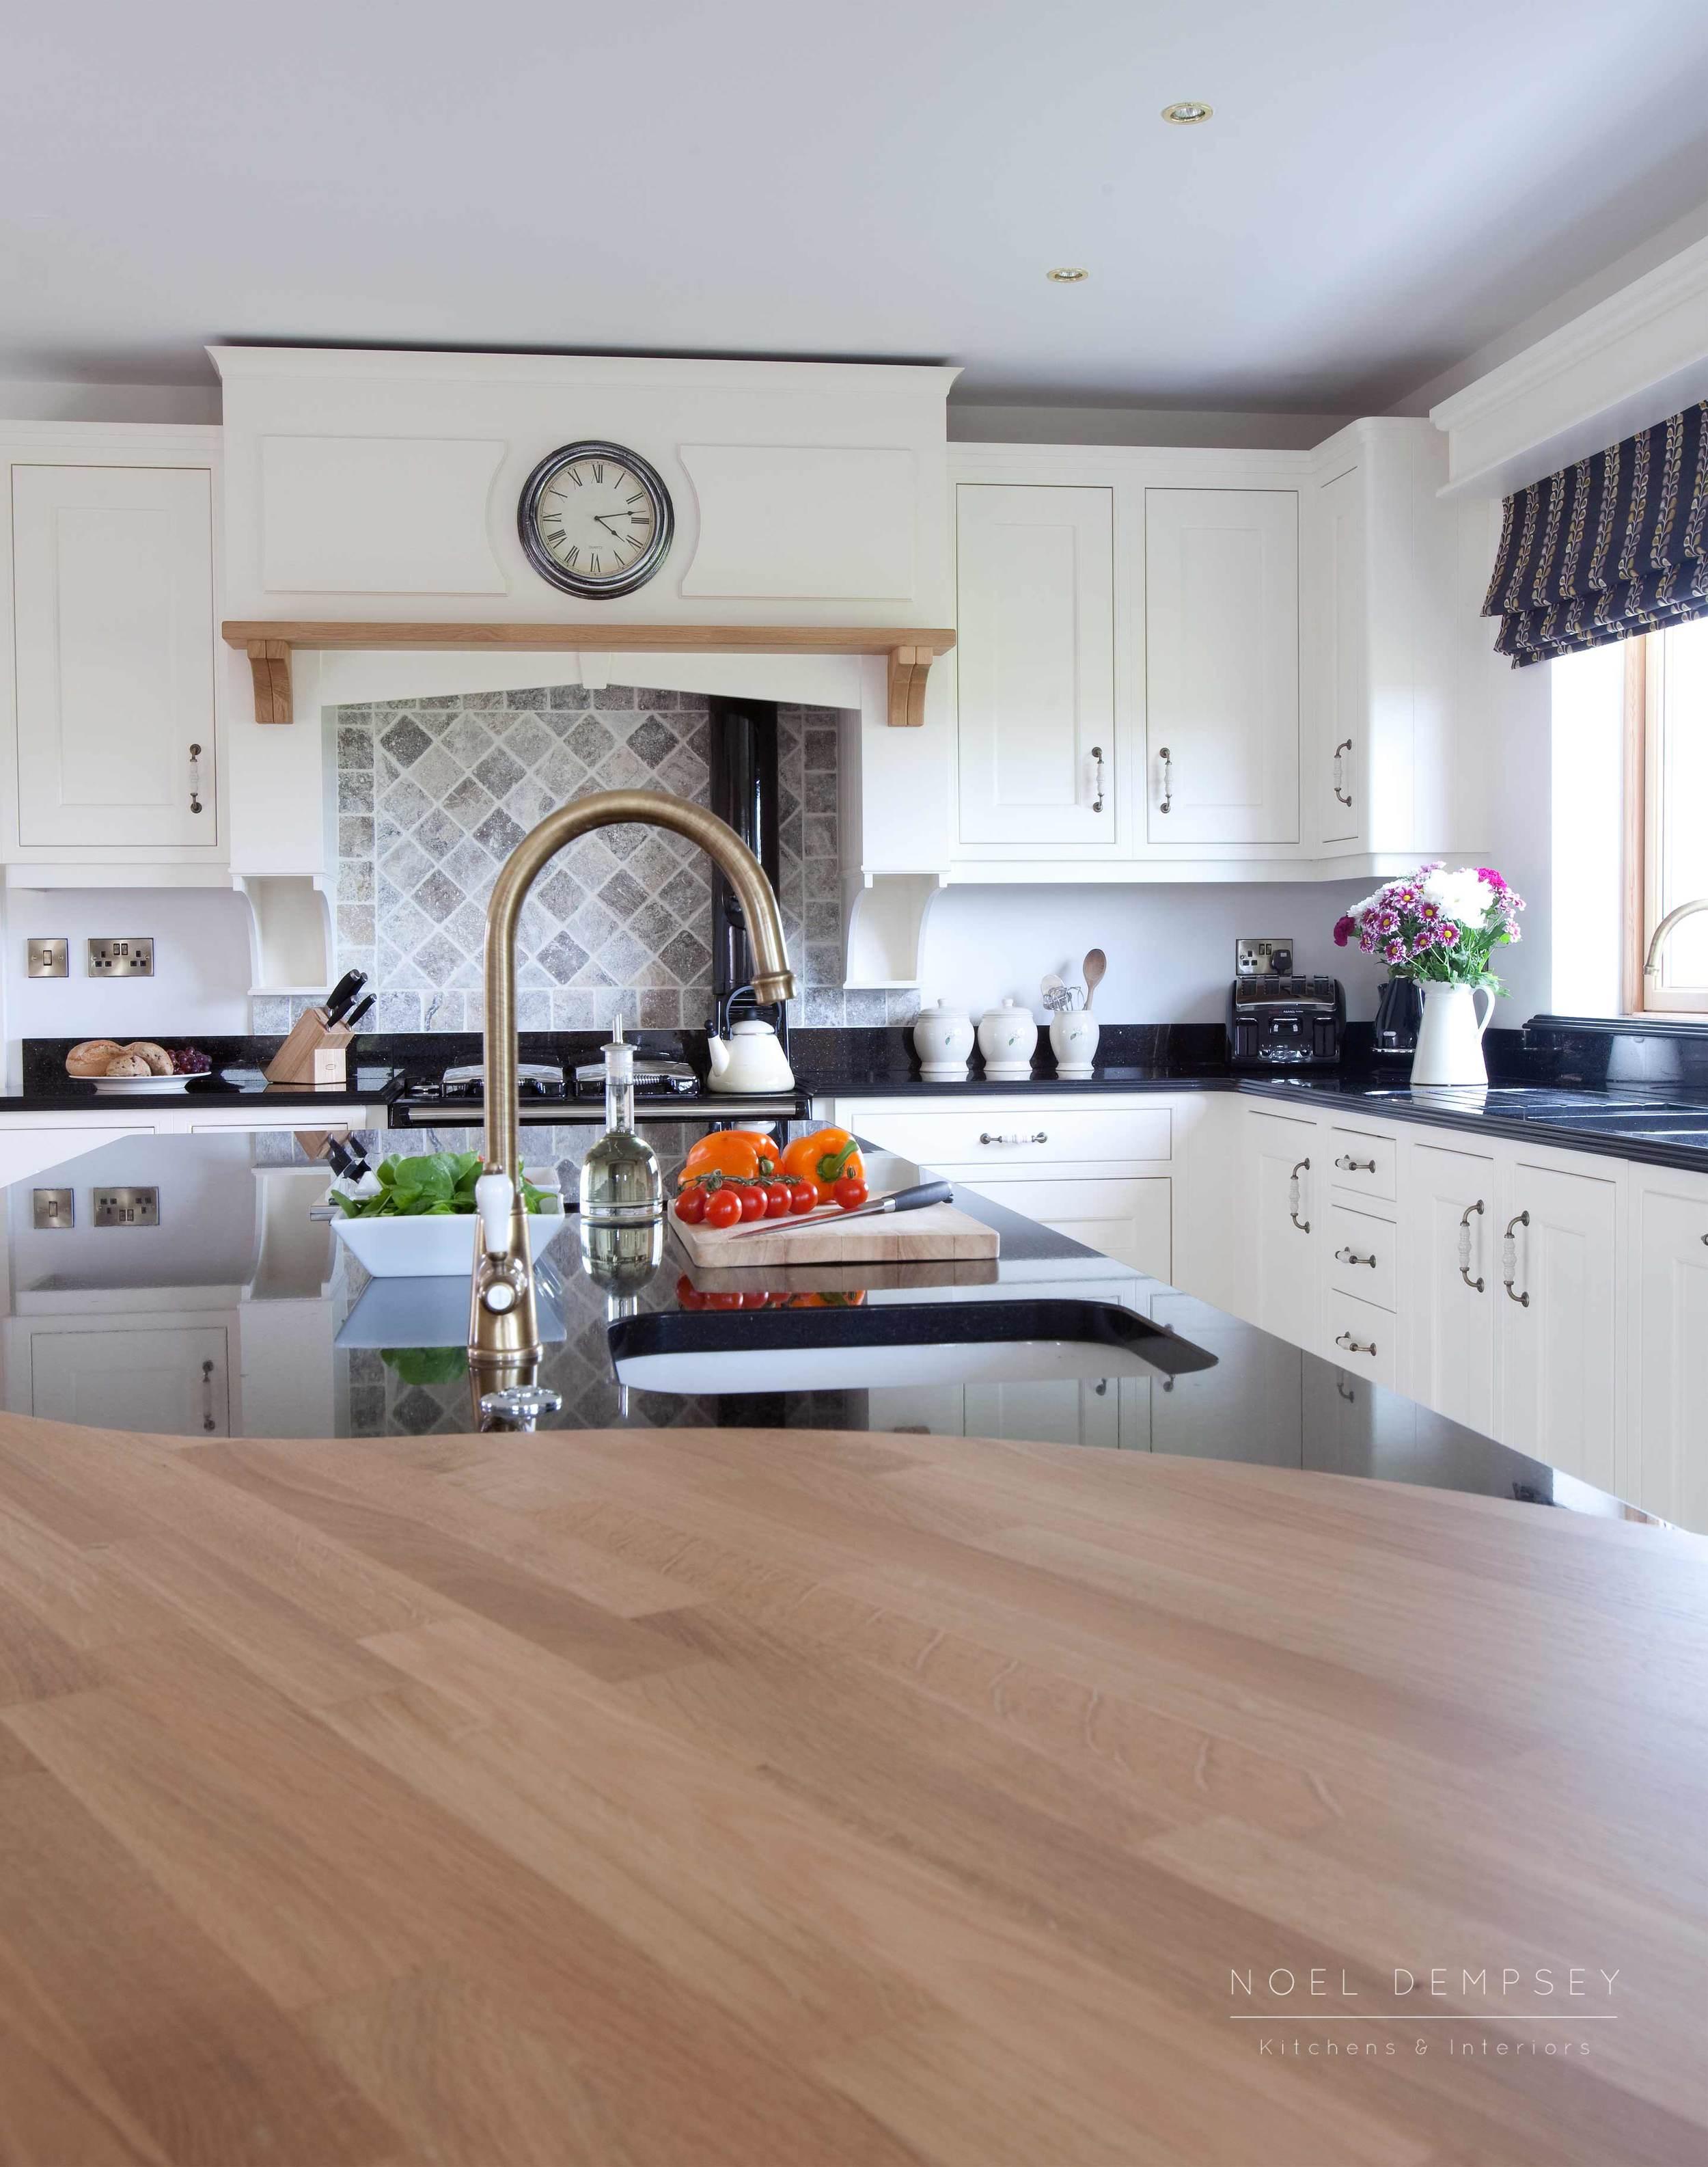 Fox-lane-inframe-hand-painted-kitchens-3.jpg